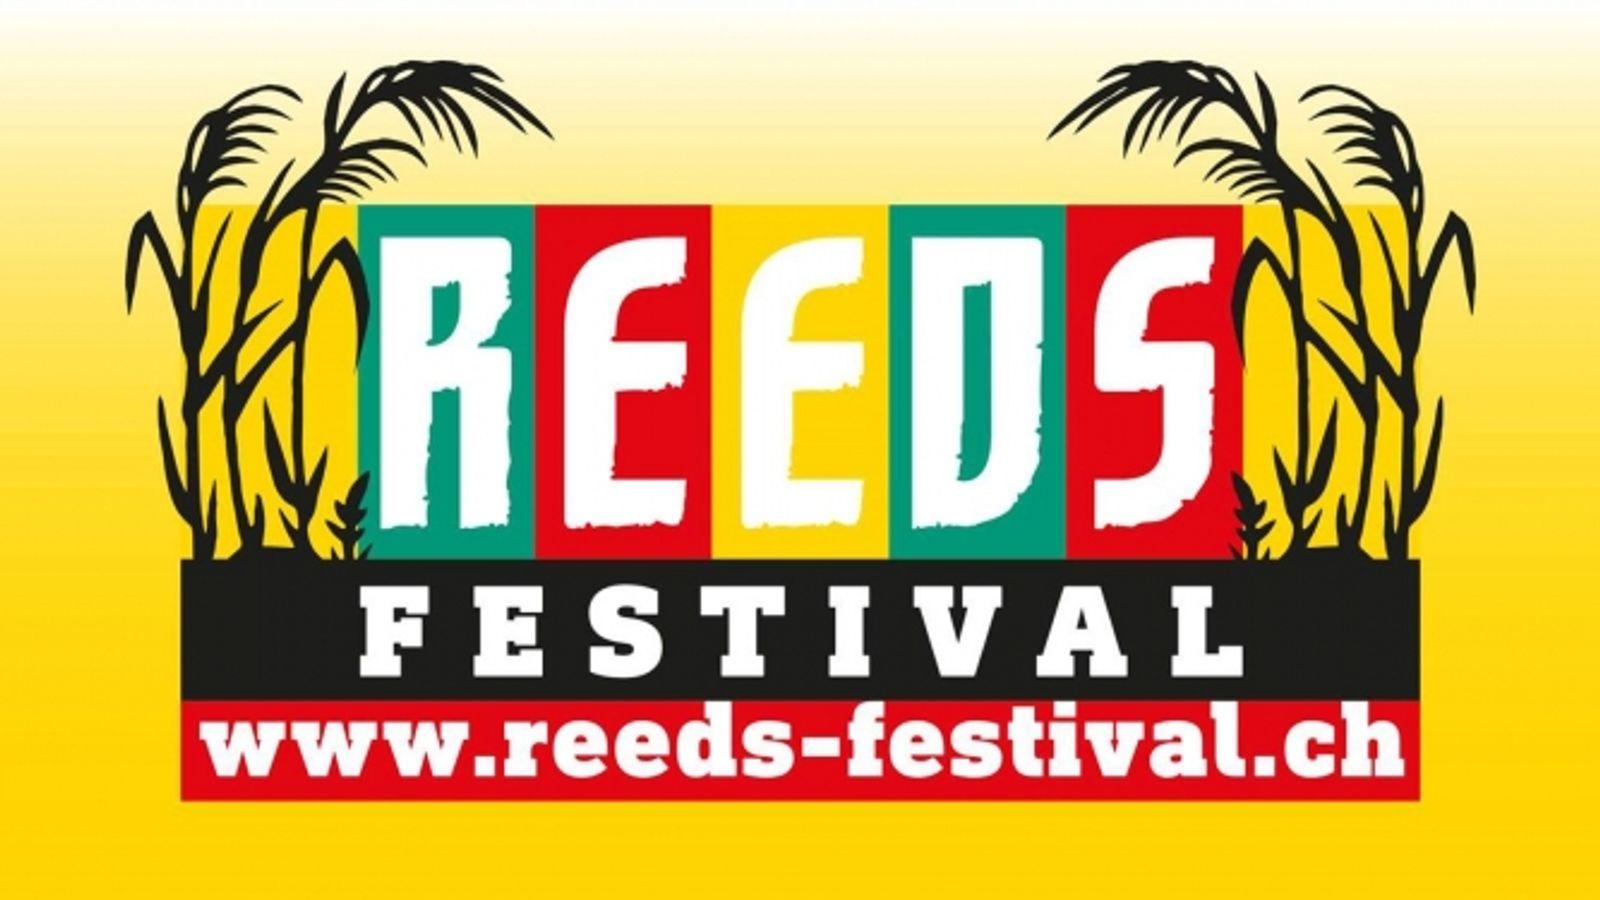 Reeds Festival 2018 Seequai Pfäffikon (ZH) Tickets